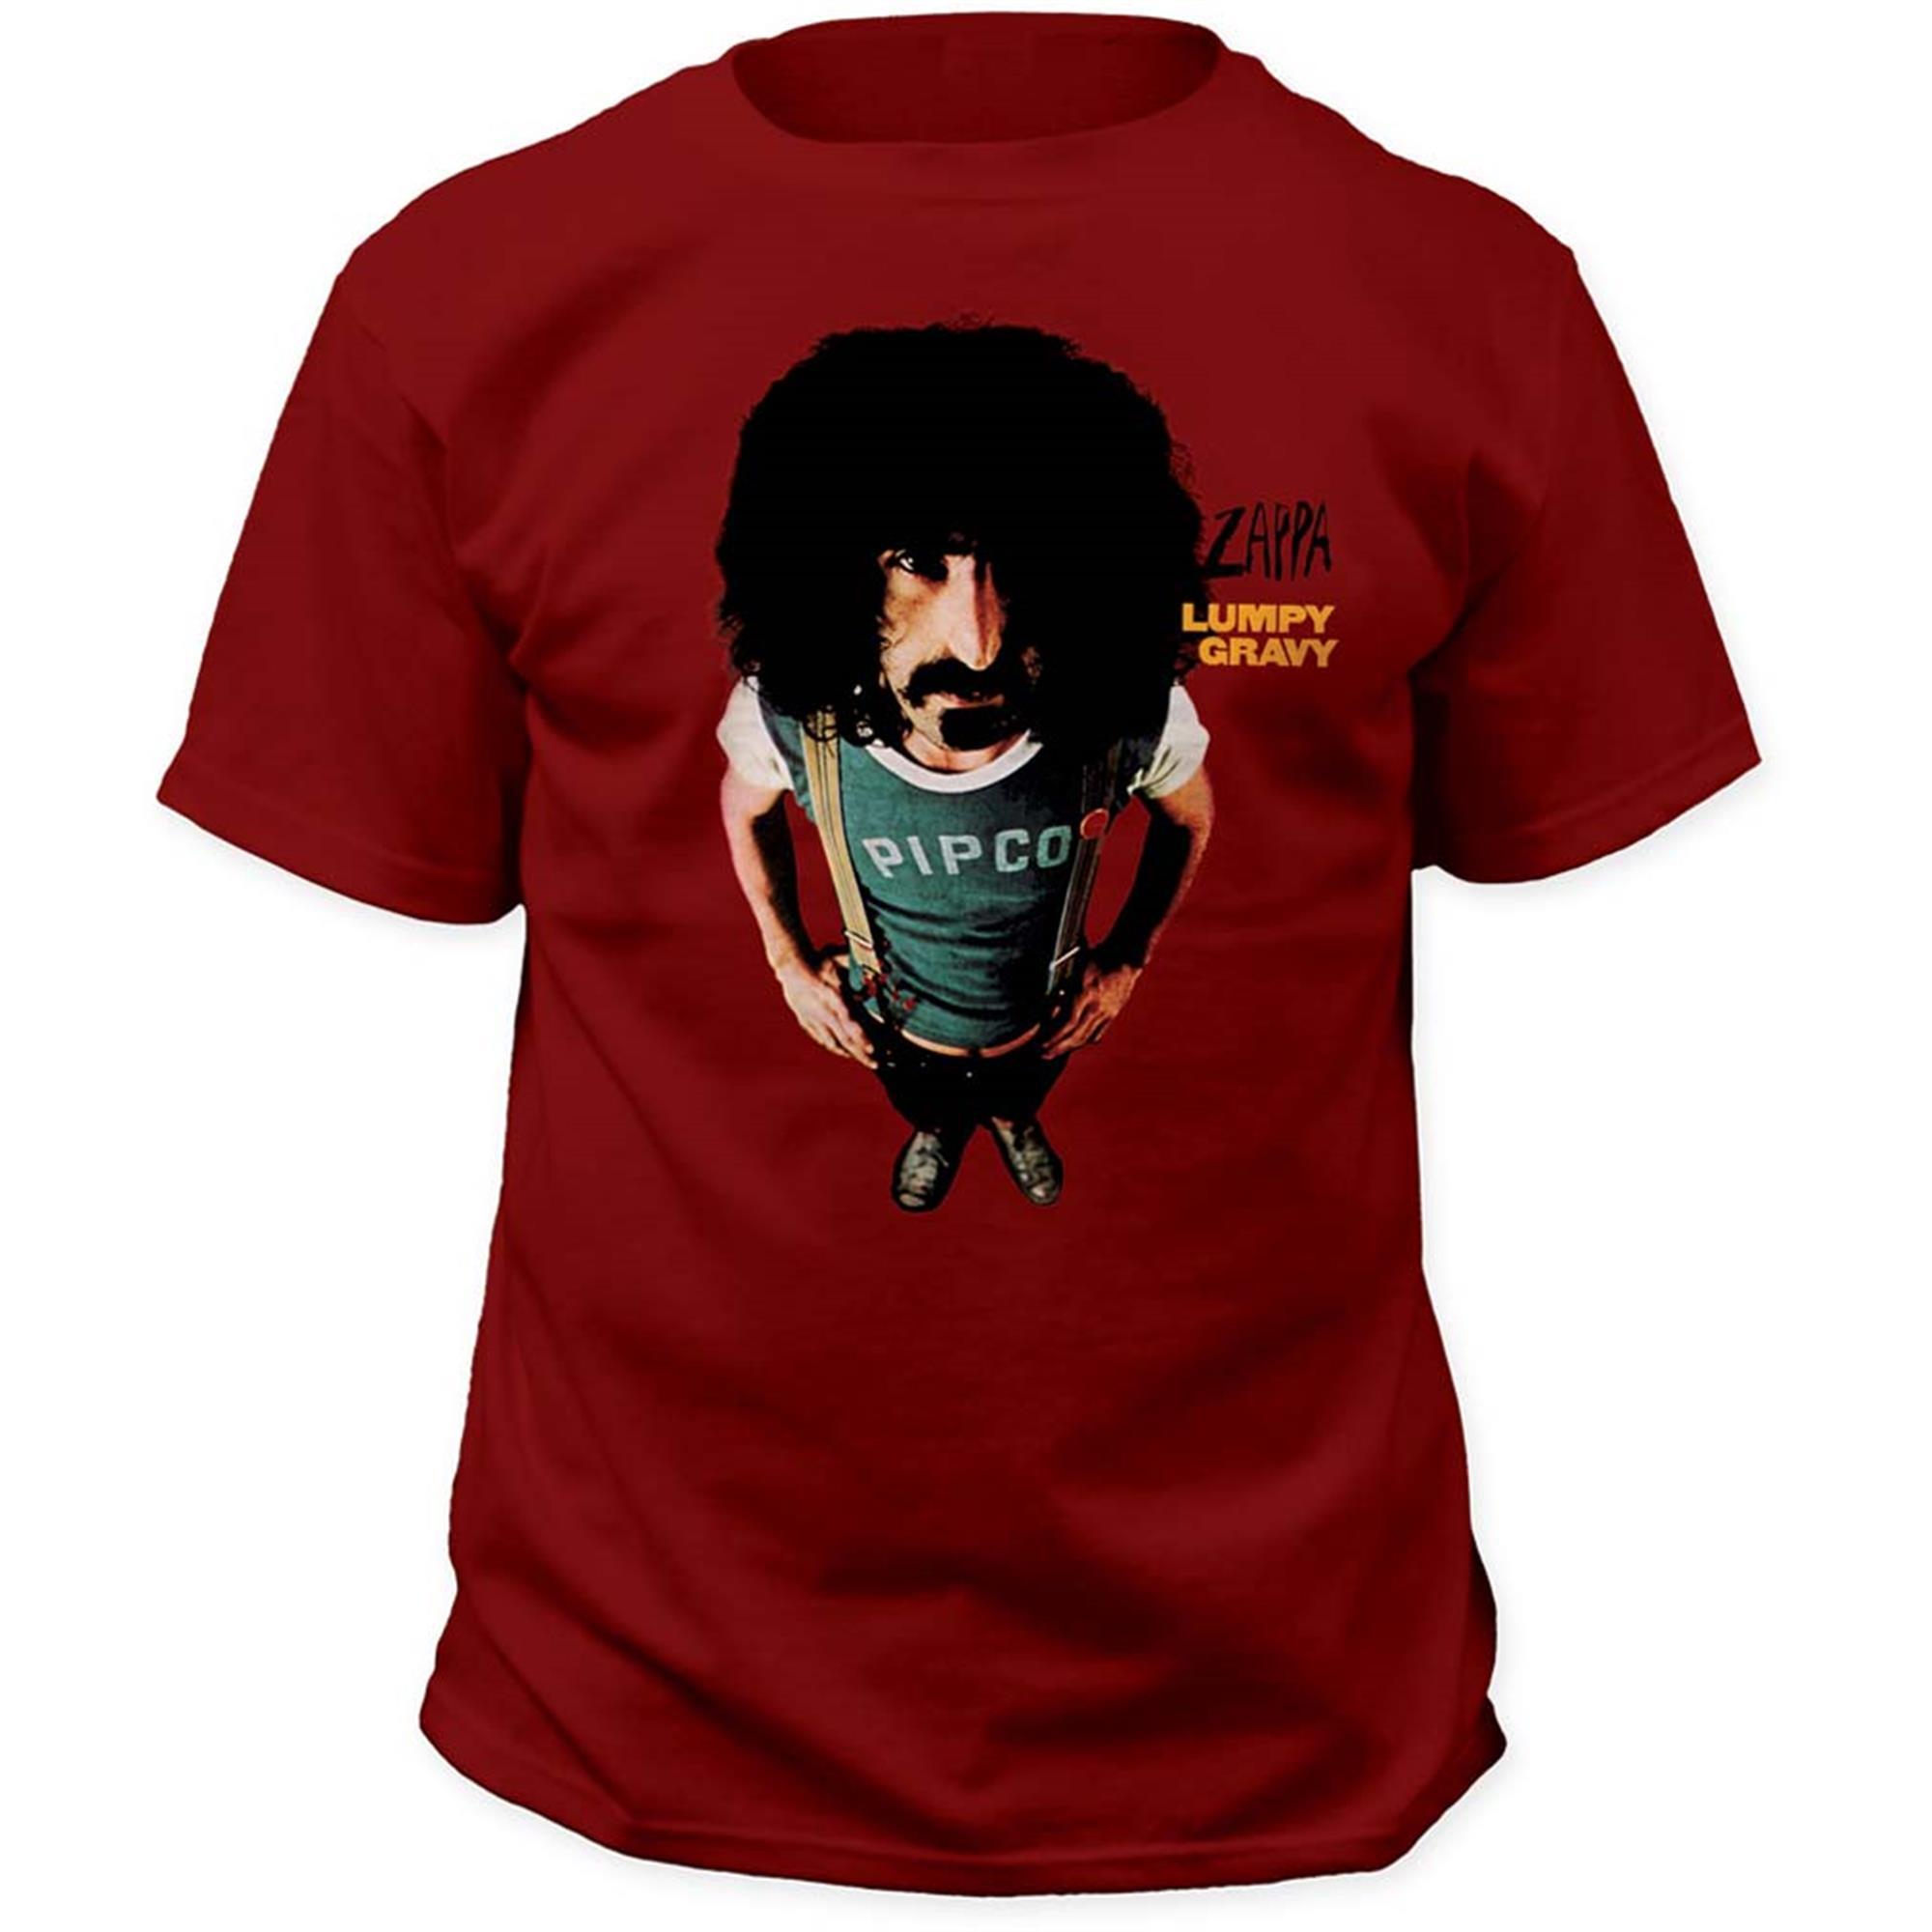 Frank Zappa Lumpy Gravy T-Shirt